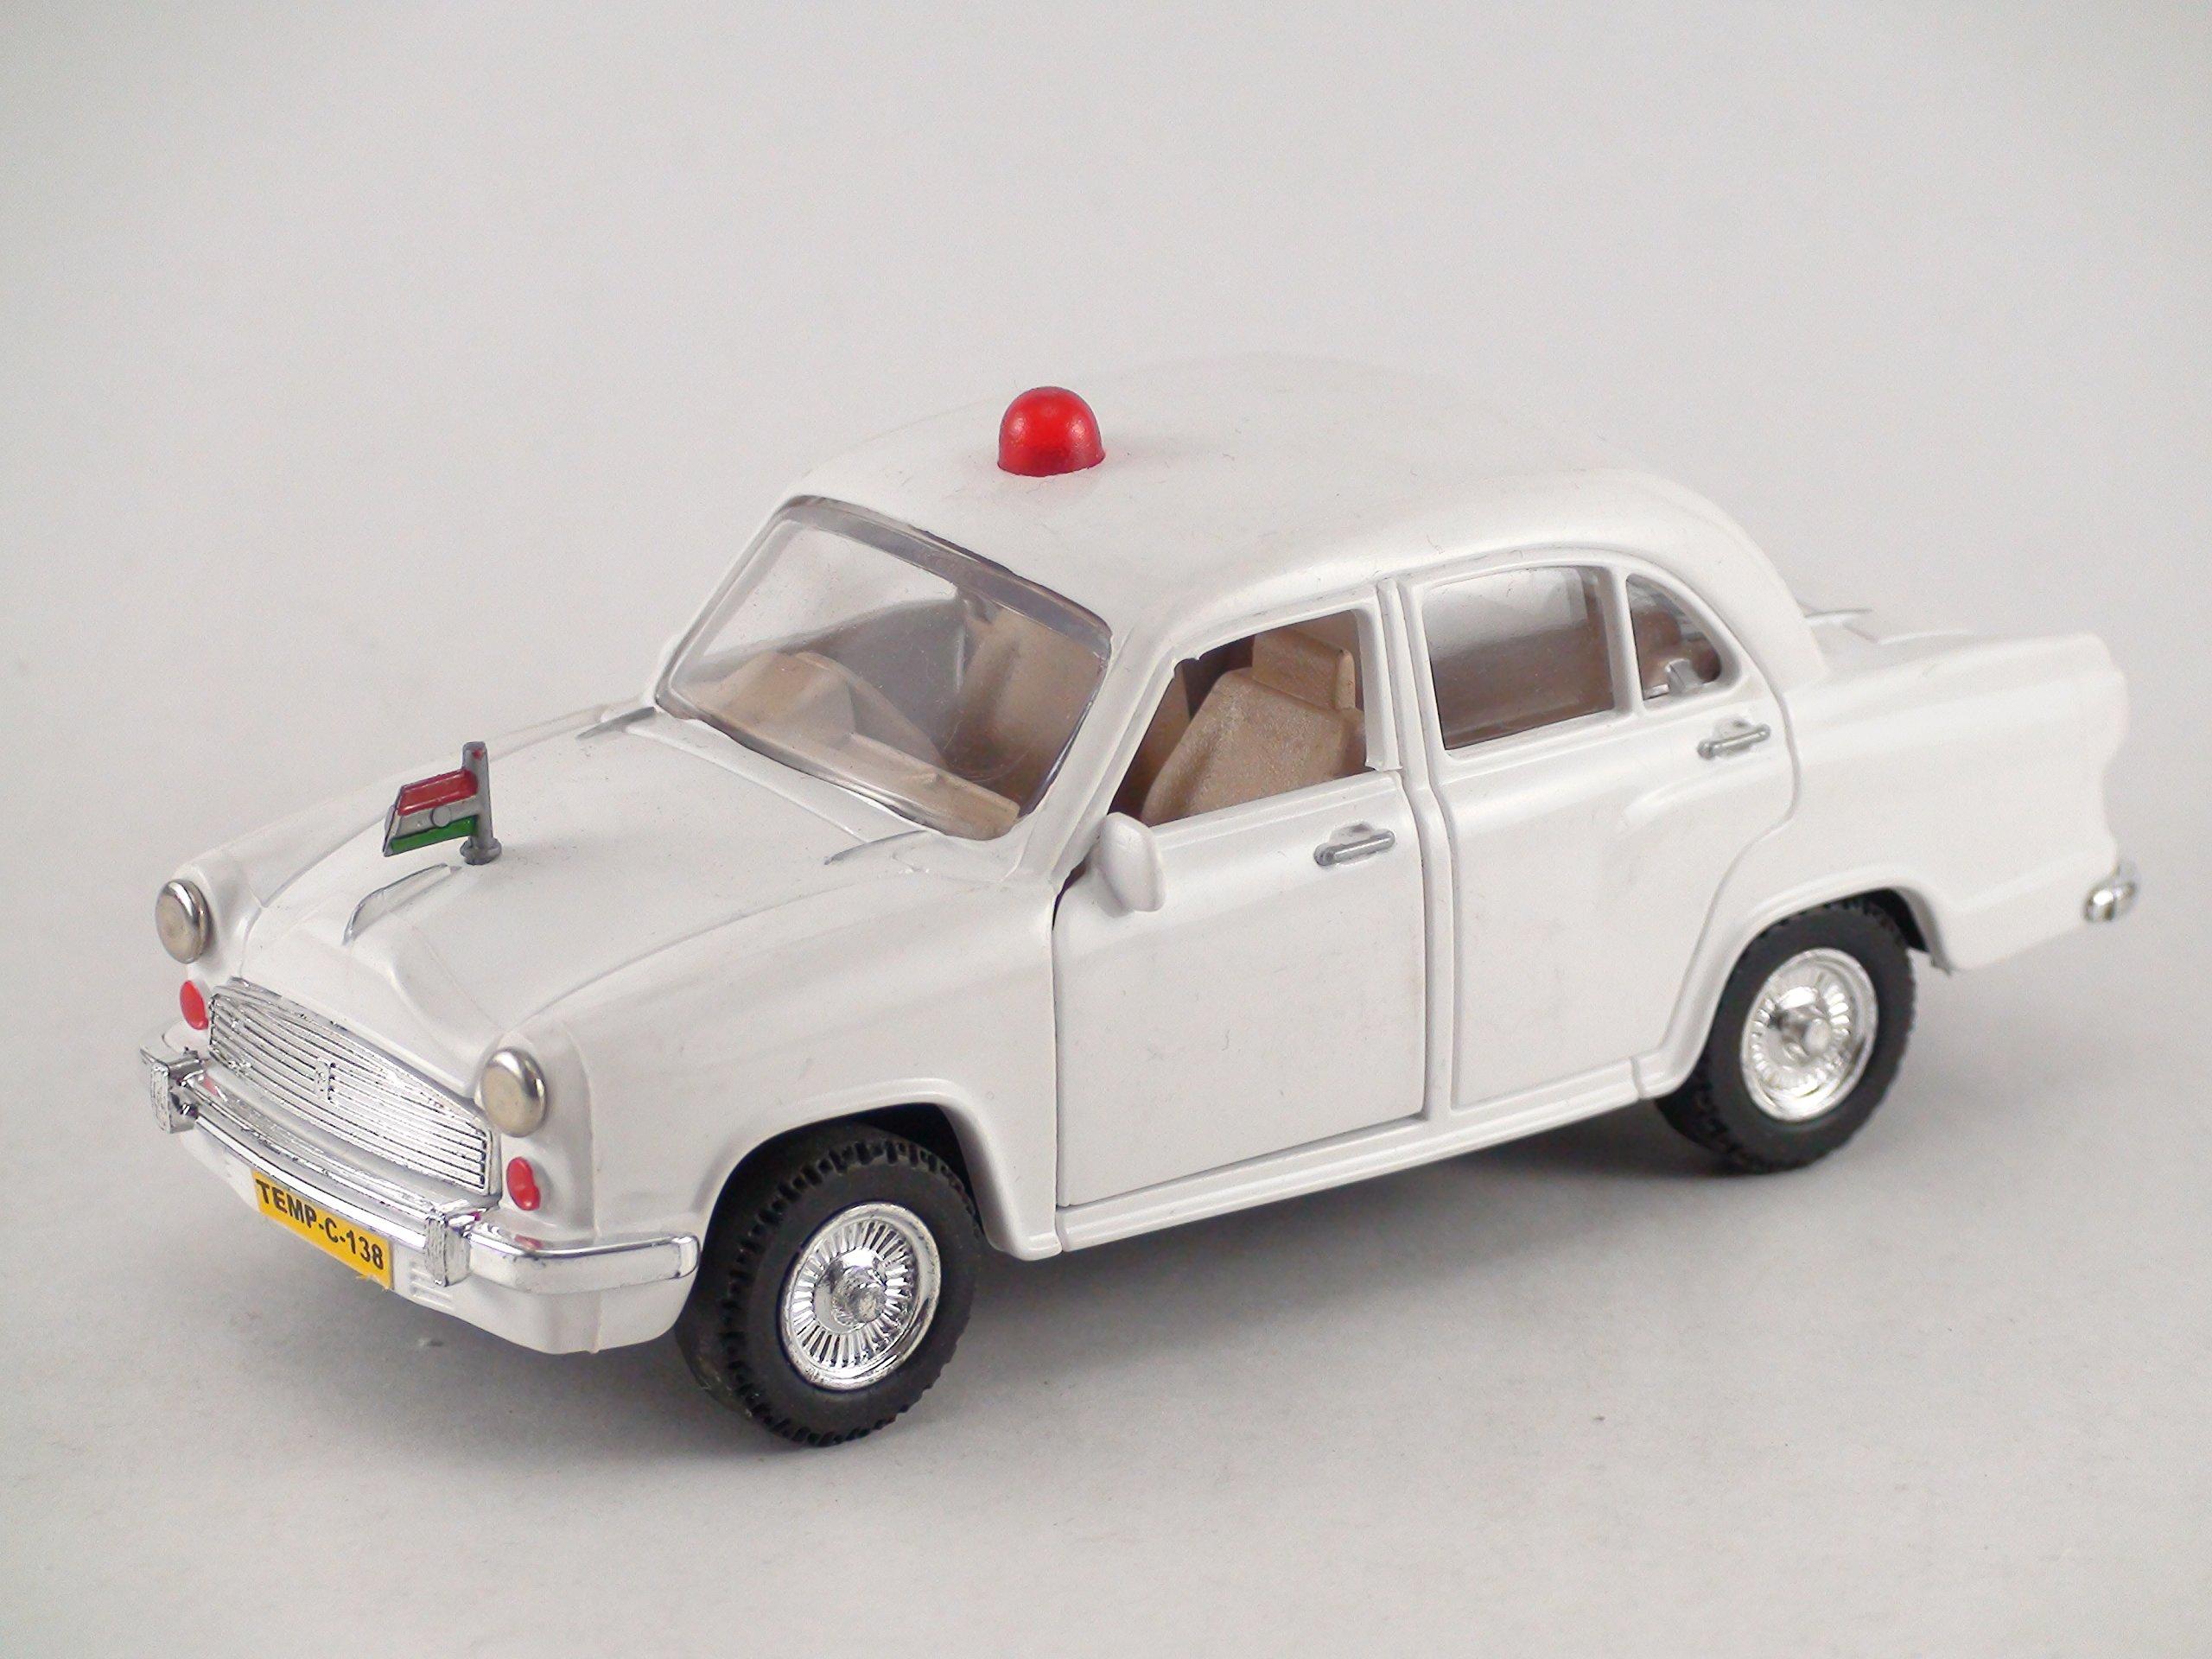 Centy Toys Classic Of Ambassador Car ( Moris Oxford)-Kidsshub 13.3 X 5.3 X 5 cm, Weight:100gms White - VIP Model product image